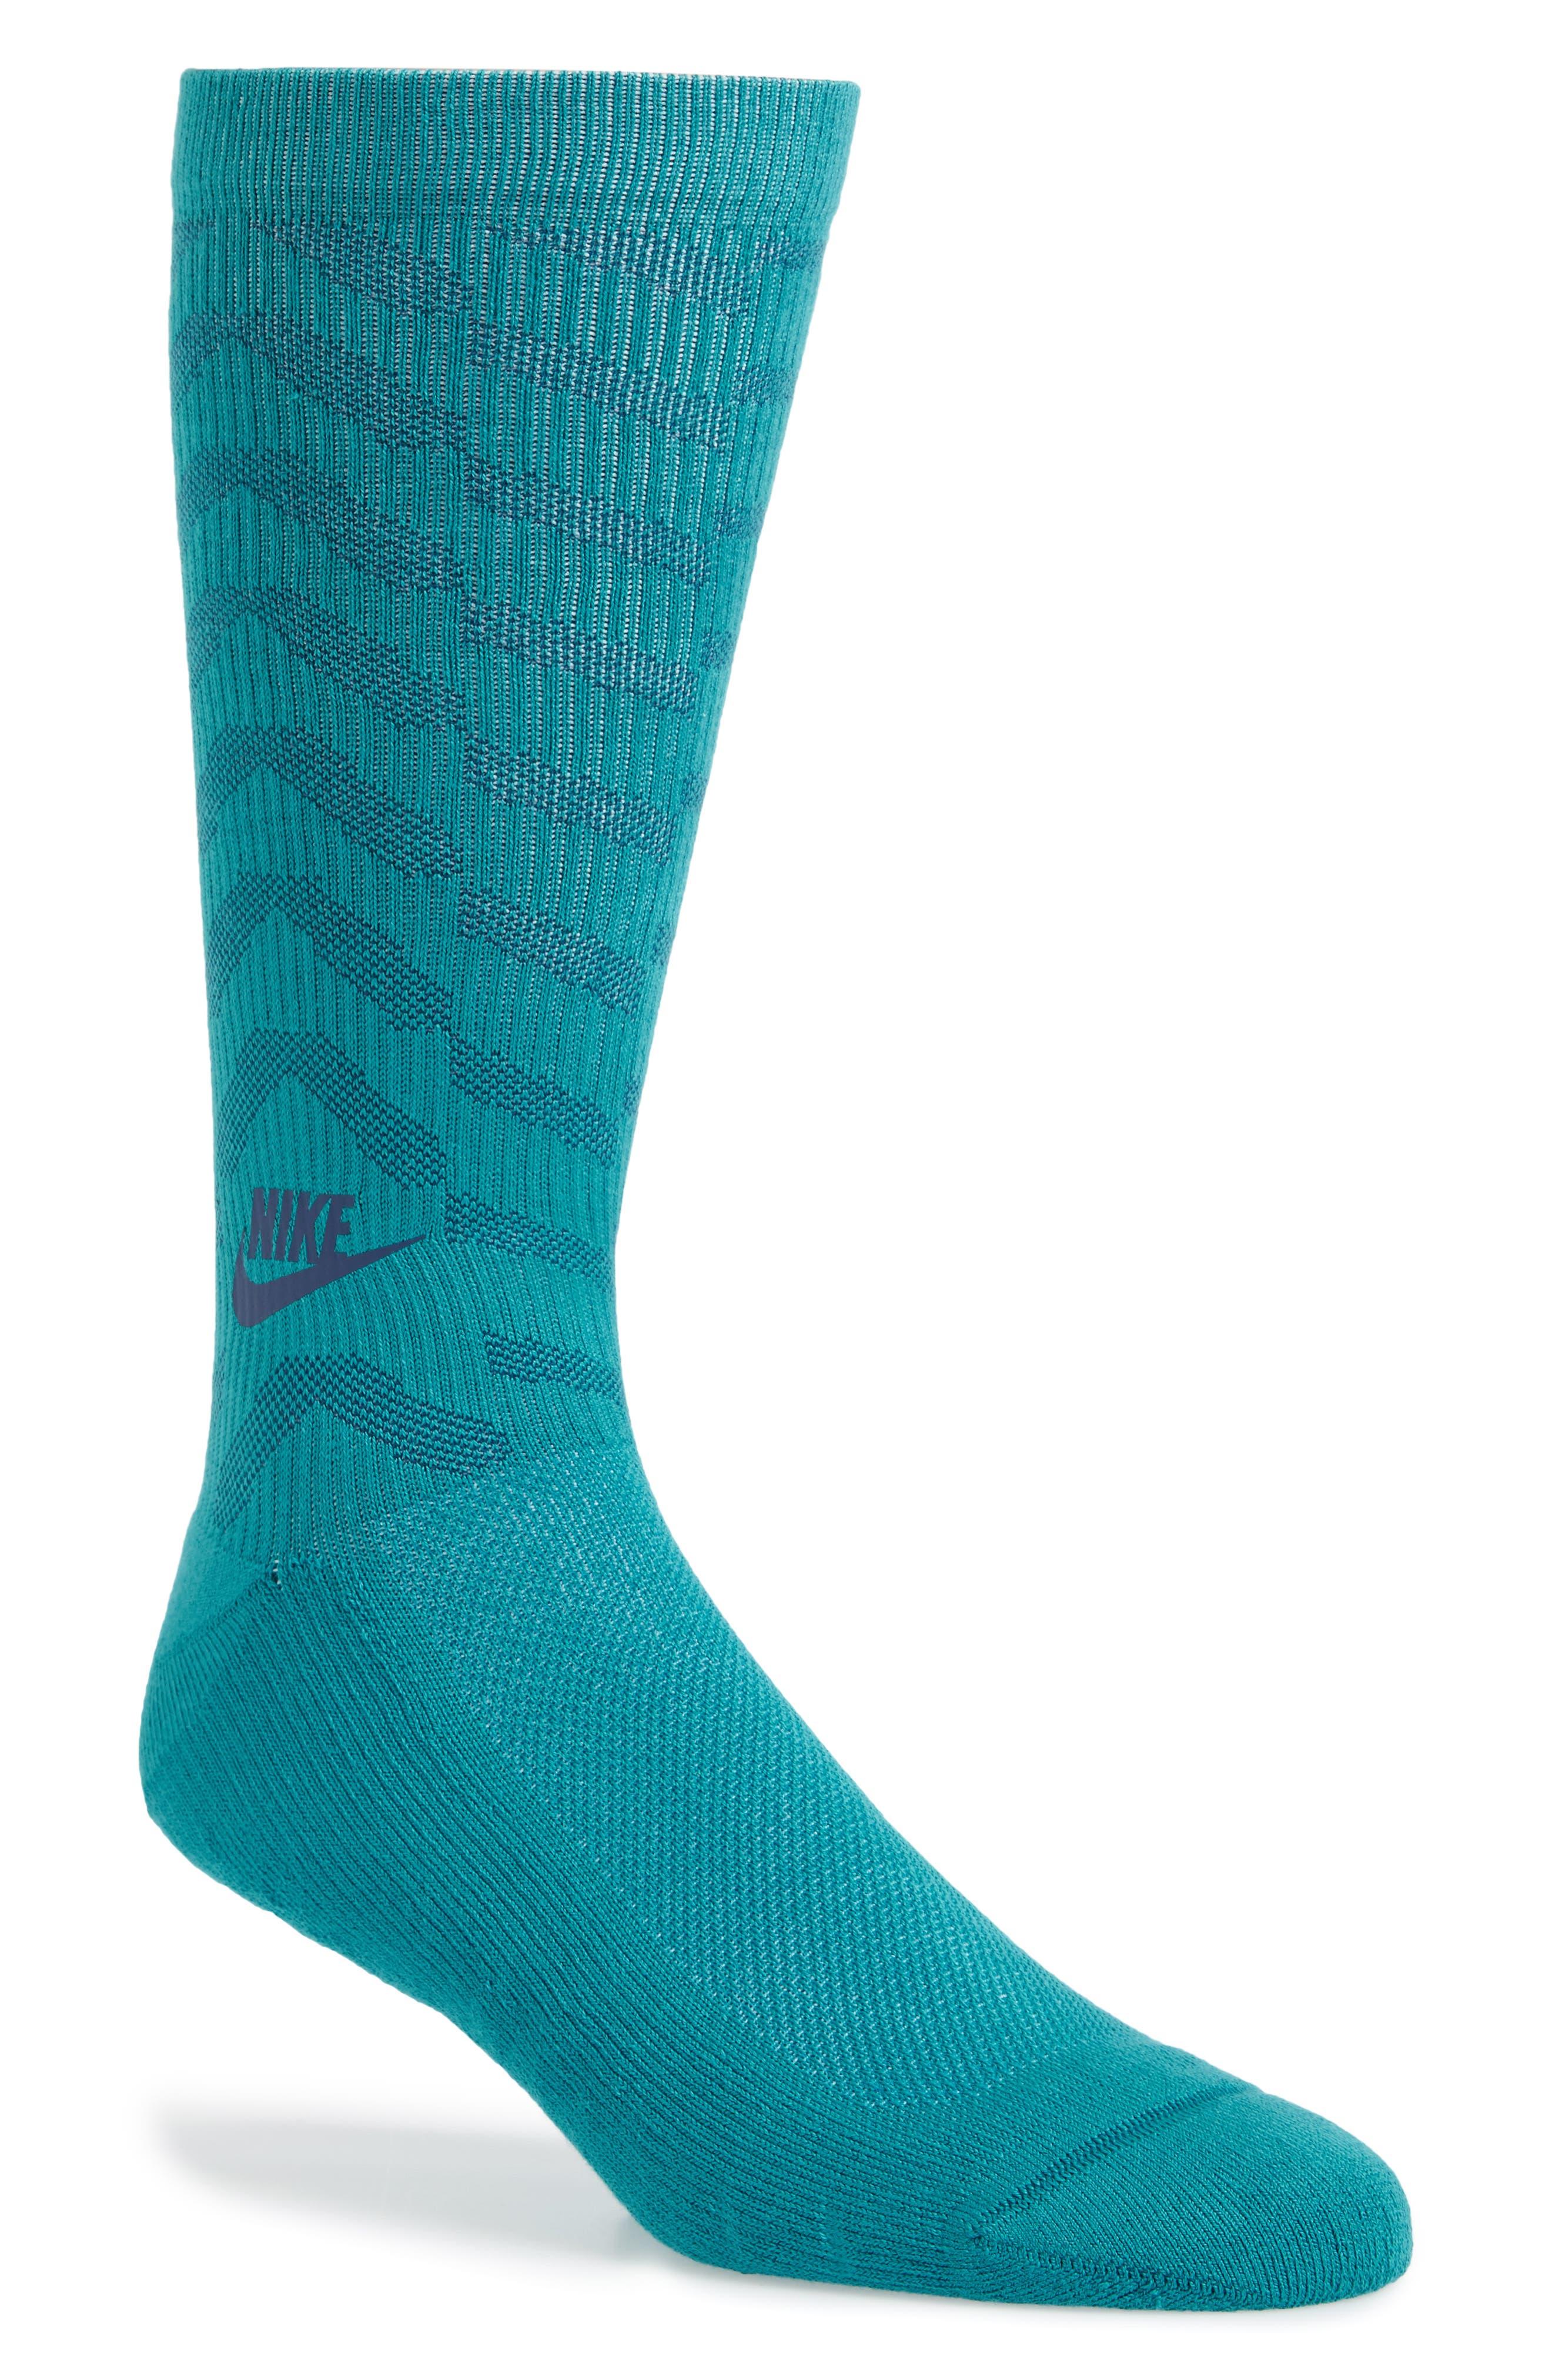 Alternate Image 1 Selected - Nike Statement Graphic Socks